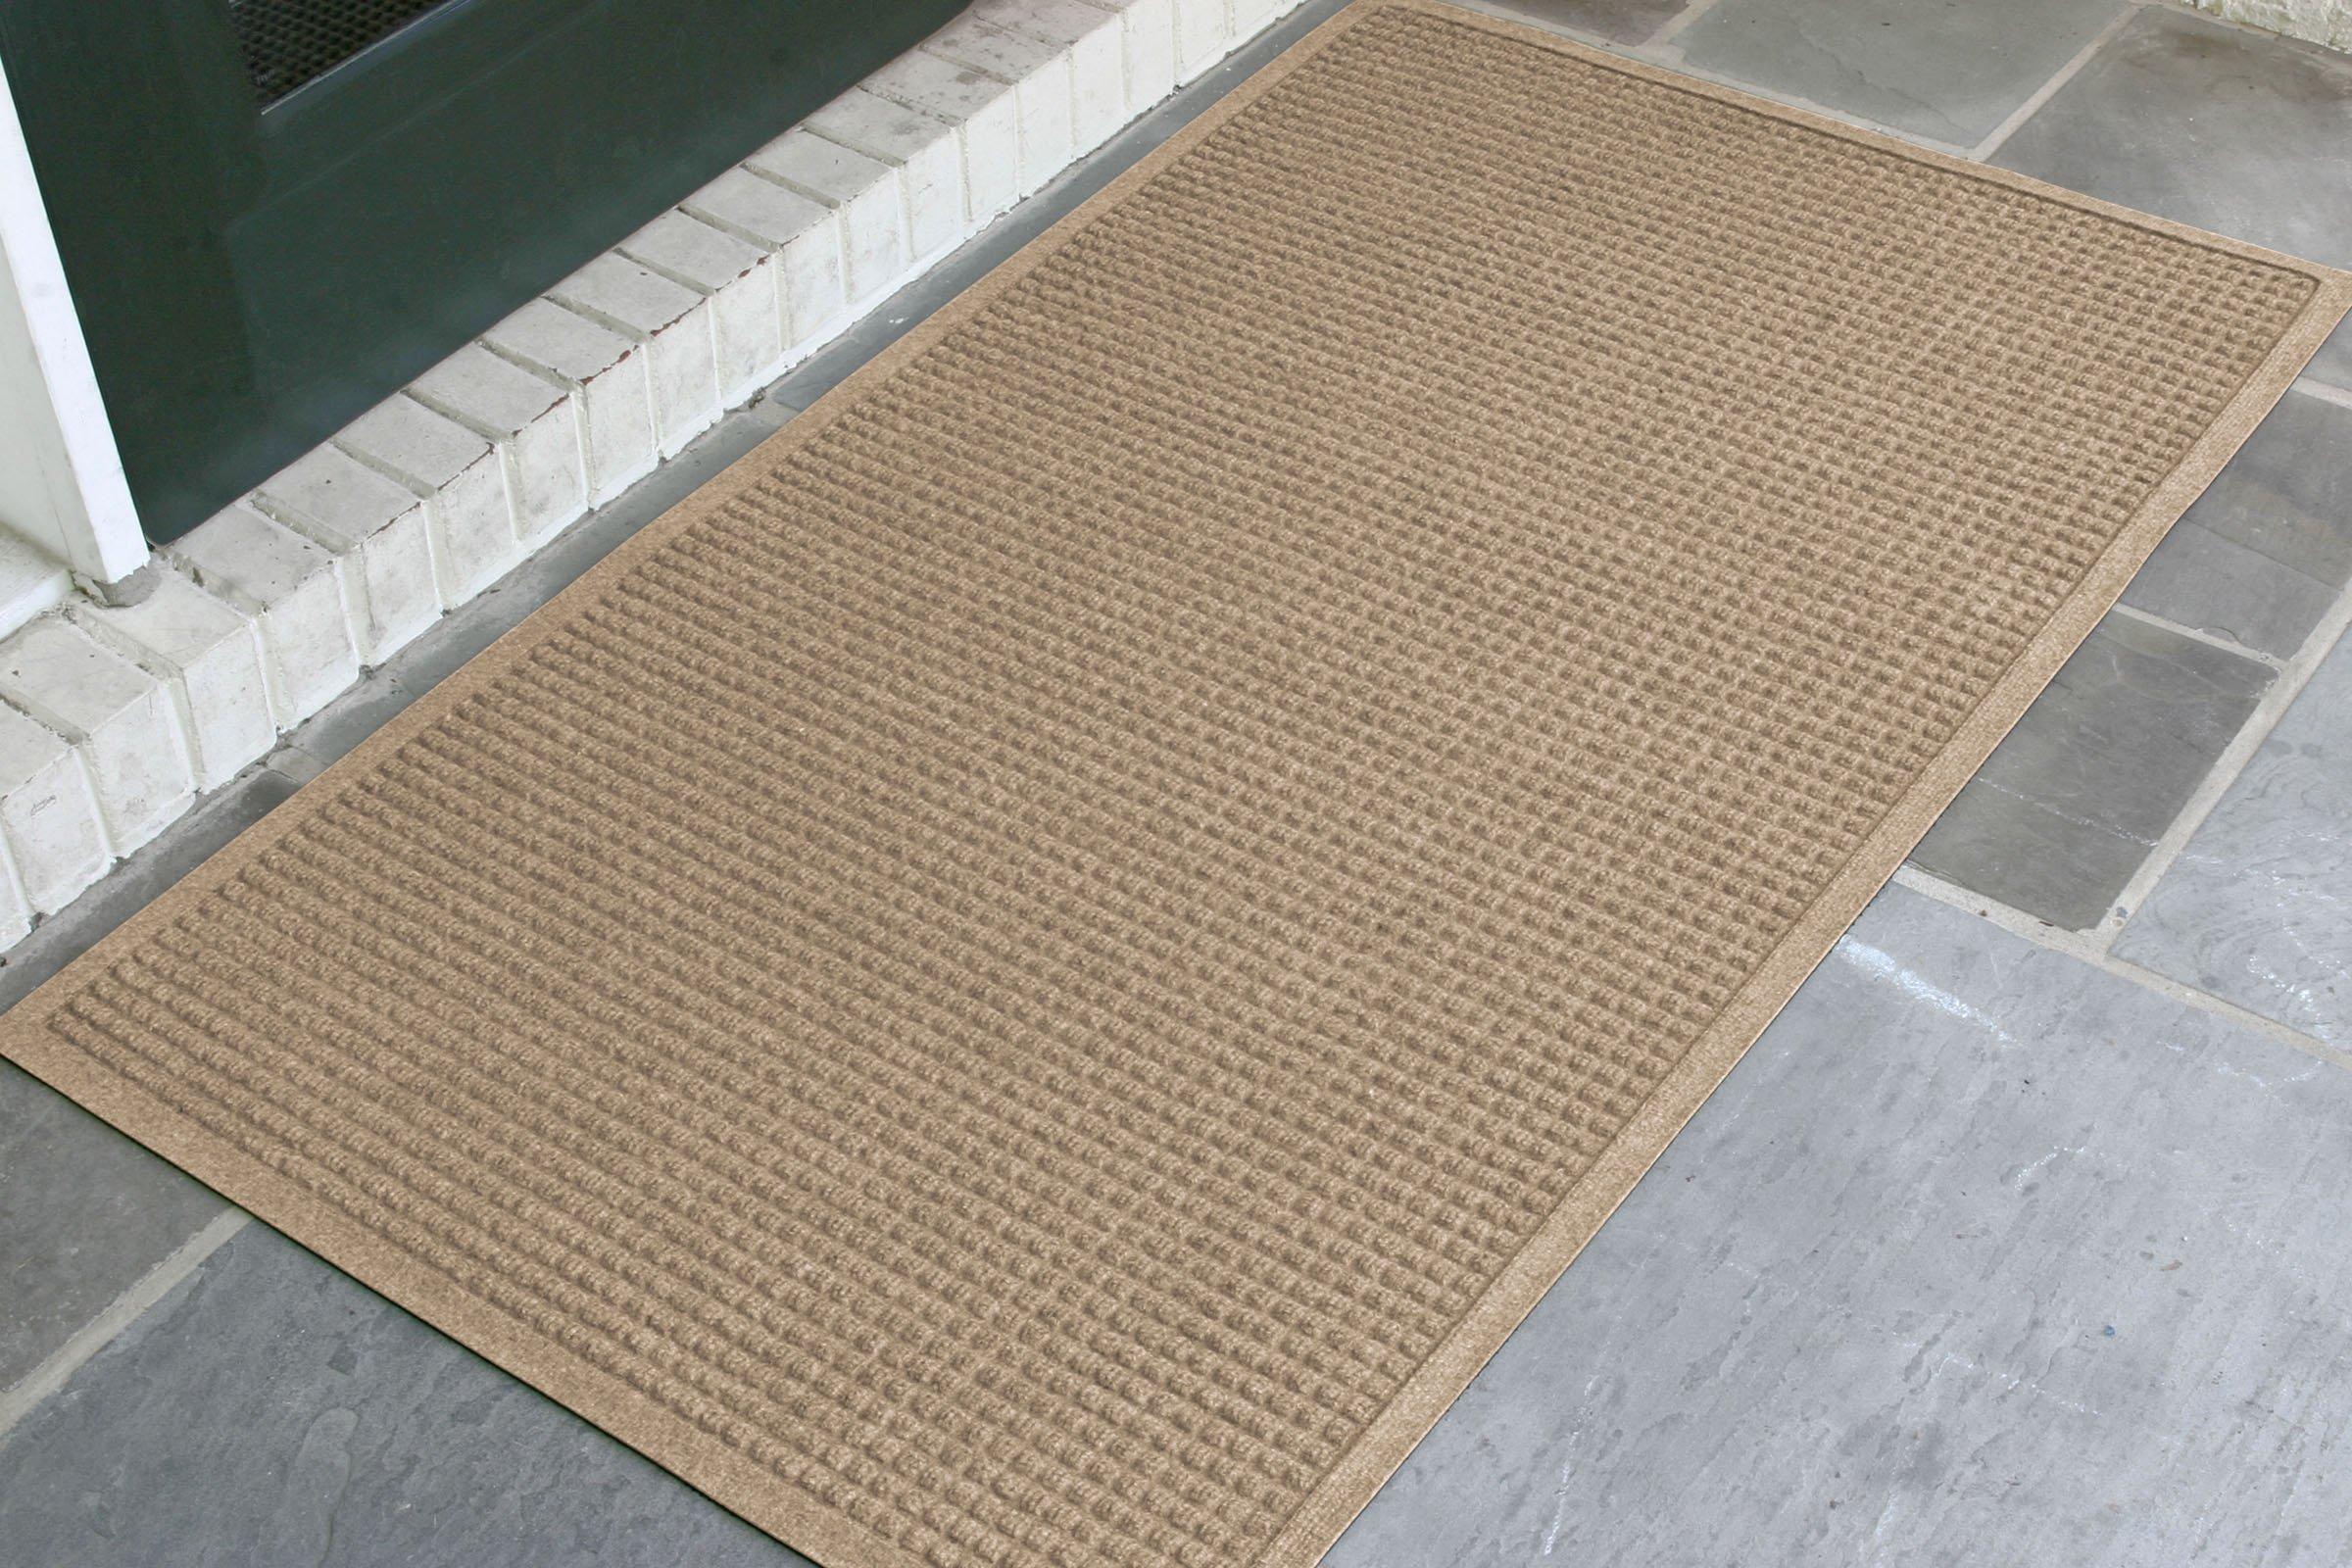 M+A Matting 280 Waterhog ECO Elite Polypropylene Entrance Indoor/Outdoor Floor Mat, SBR Rubber Backing, 5' Length x 3' Width, 3/8'' Thick, Camel